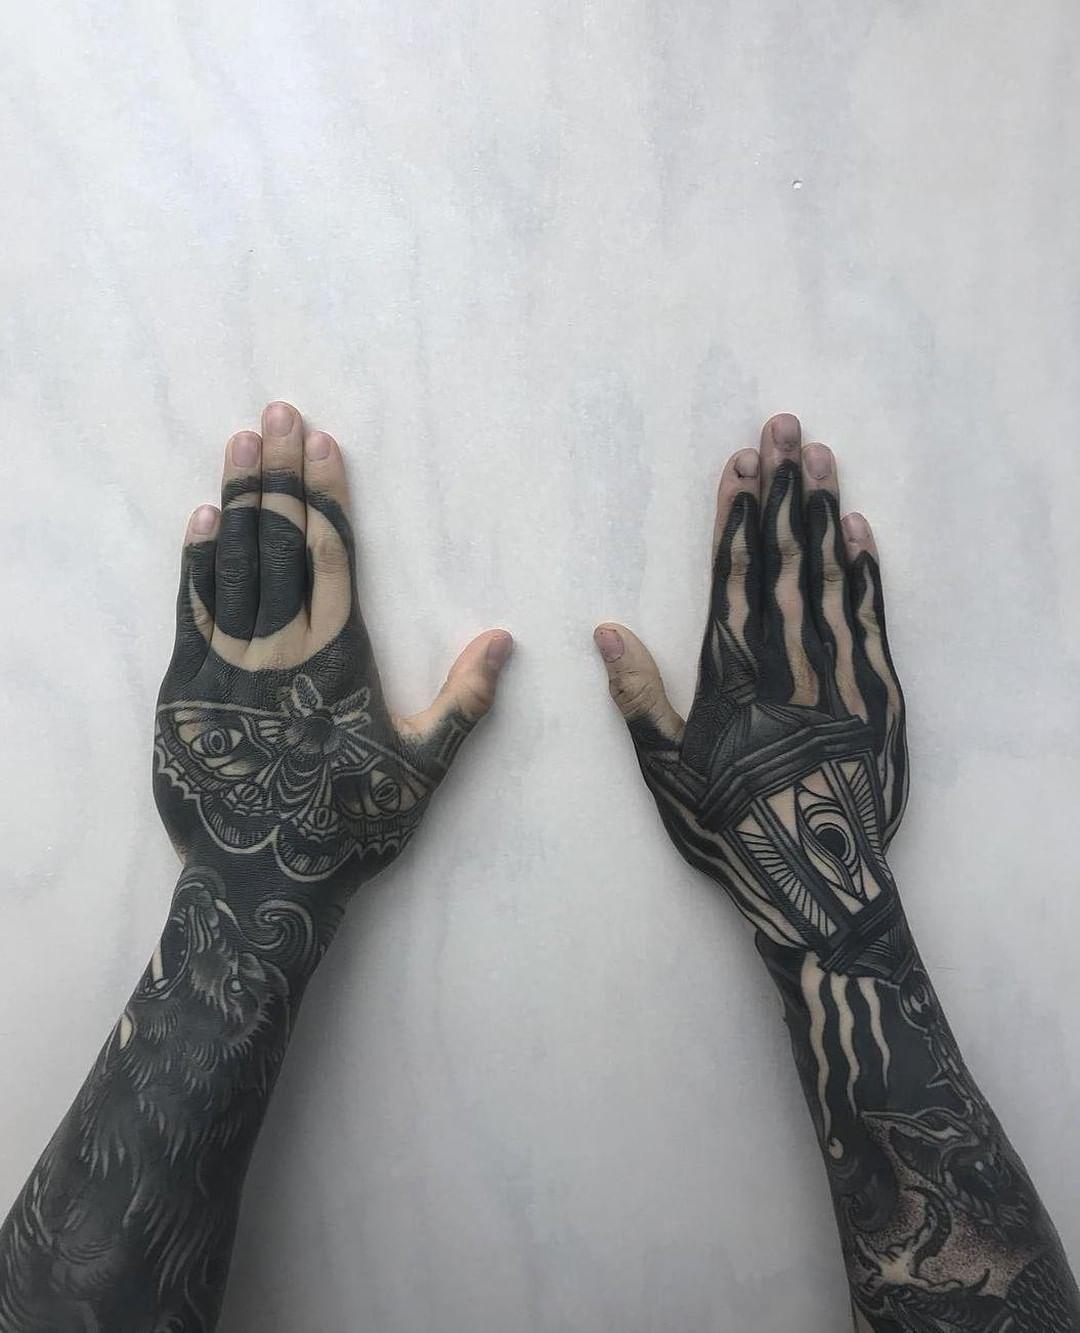 Amazing Healed Crescent Moth And Lantern Scrutinize Hand Tattoos By Mr Tumaru That Survive The Palms Navrhy Tetovani Tetovani Nausnice